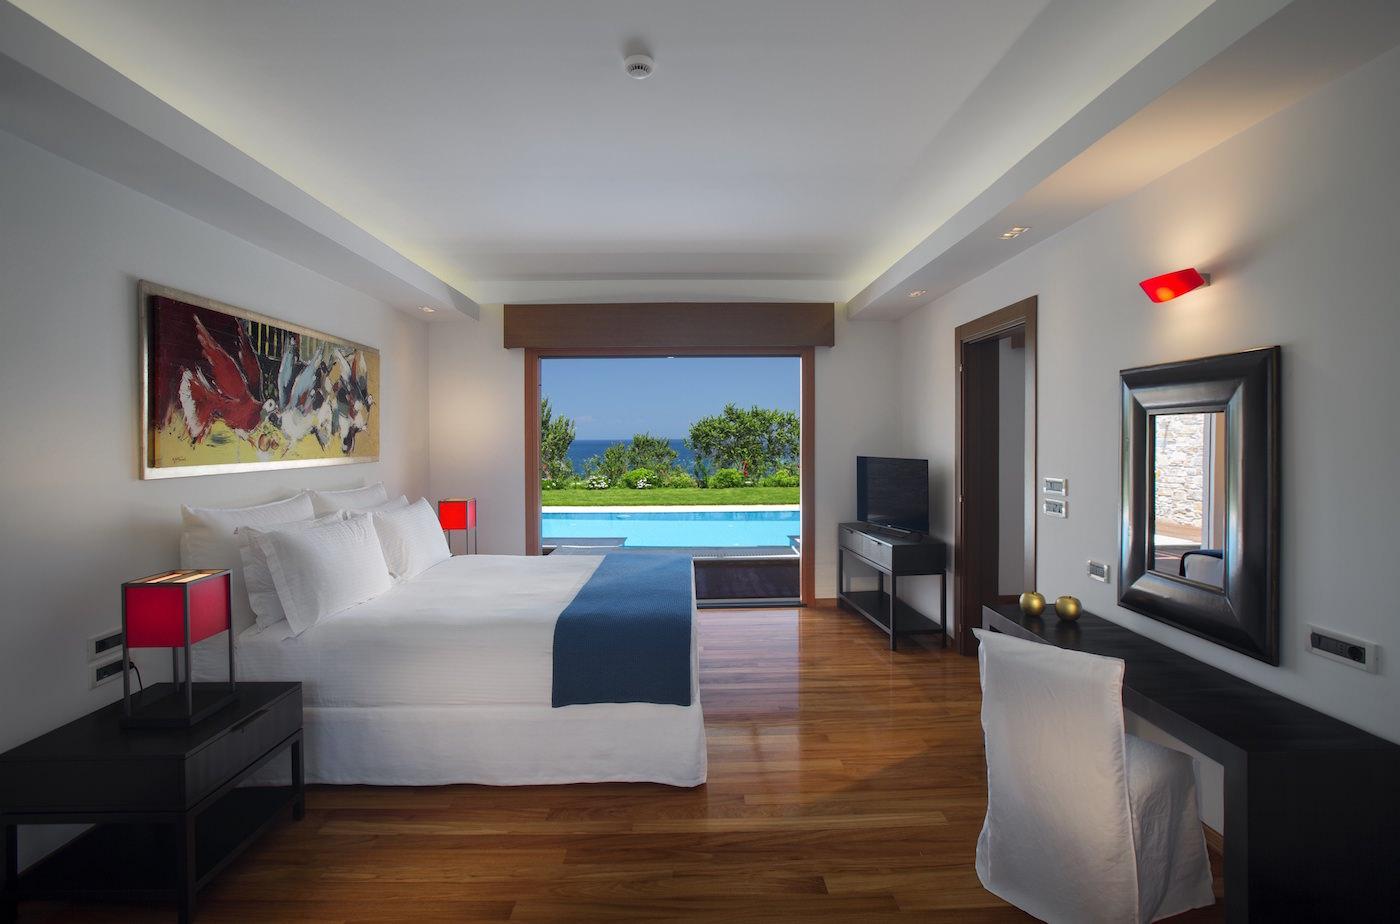 Top Luxury Villa in Greece Best Resort in Greece King size bed Private Pool Best